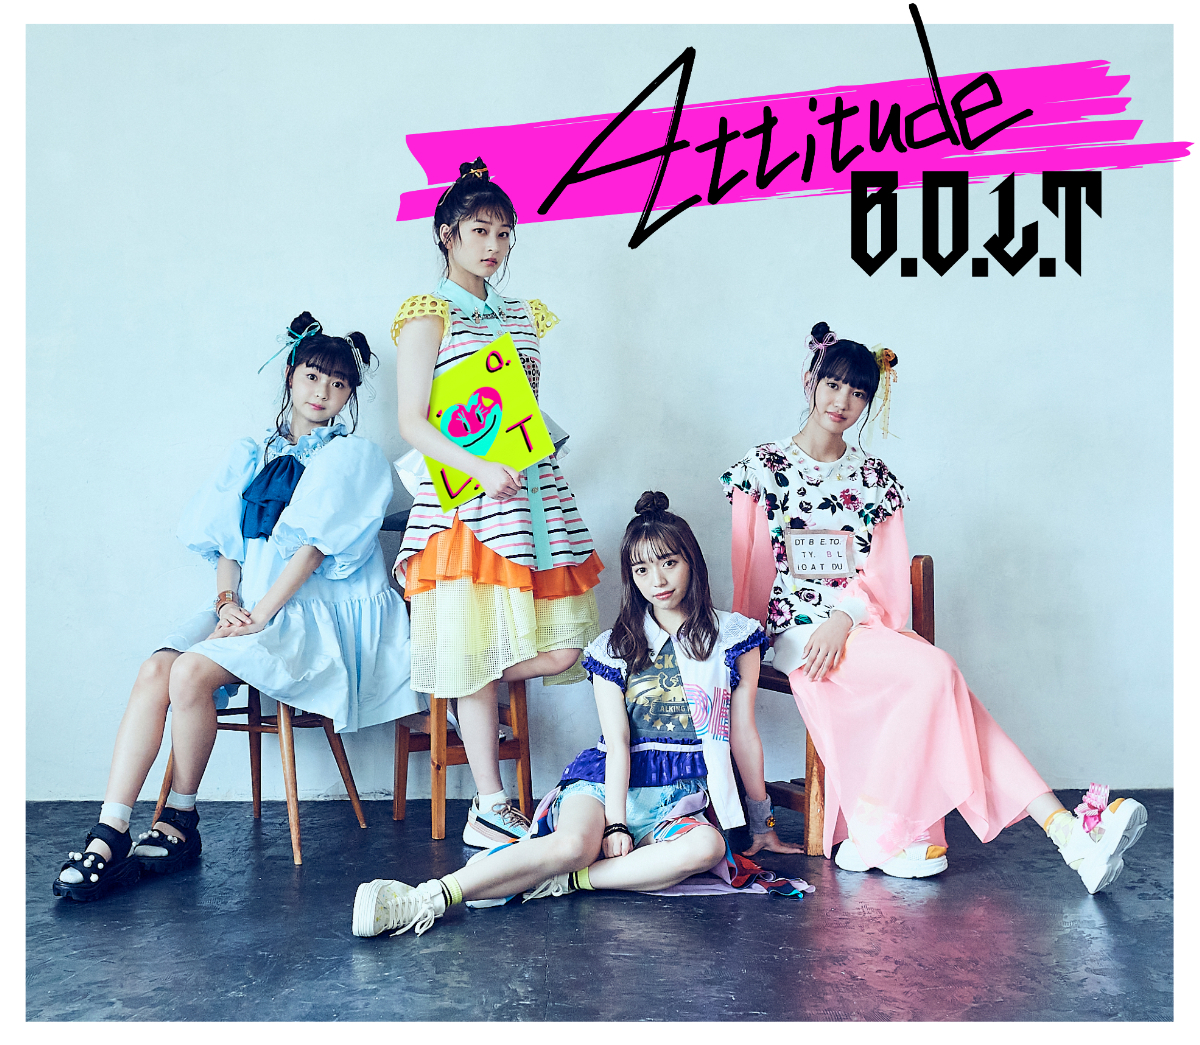 『Attitude』【初回限定盤A】ジャケット